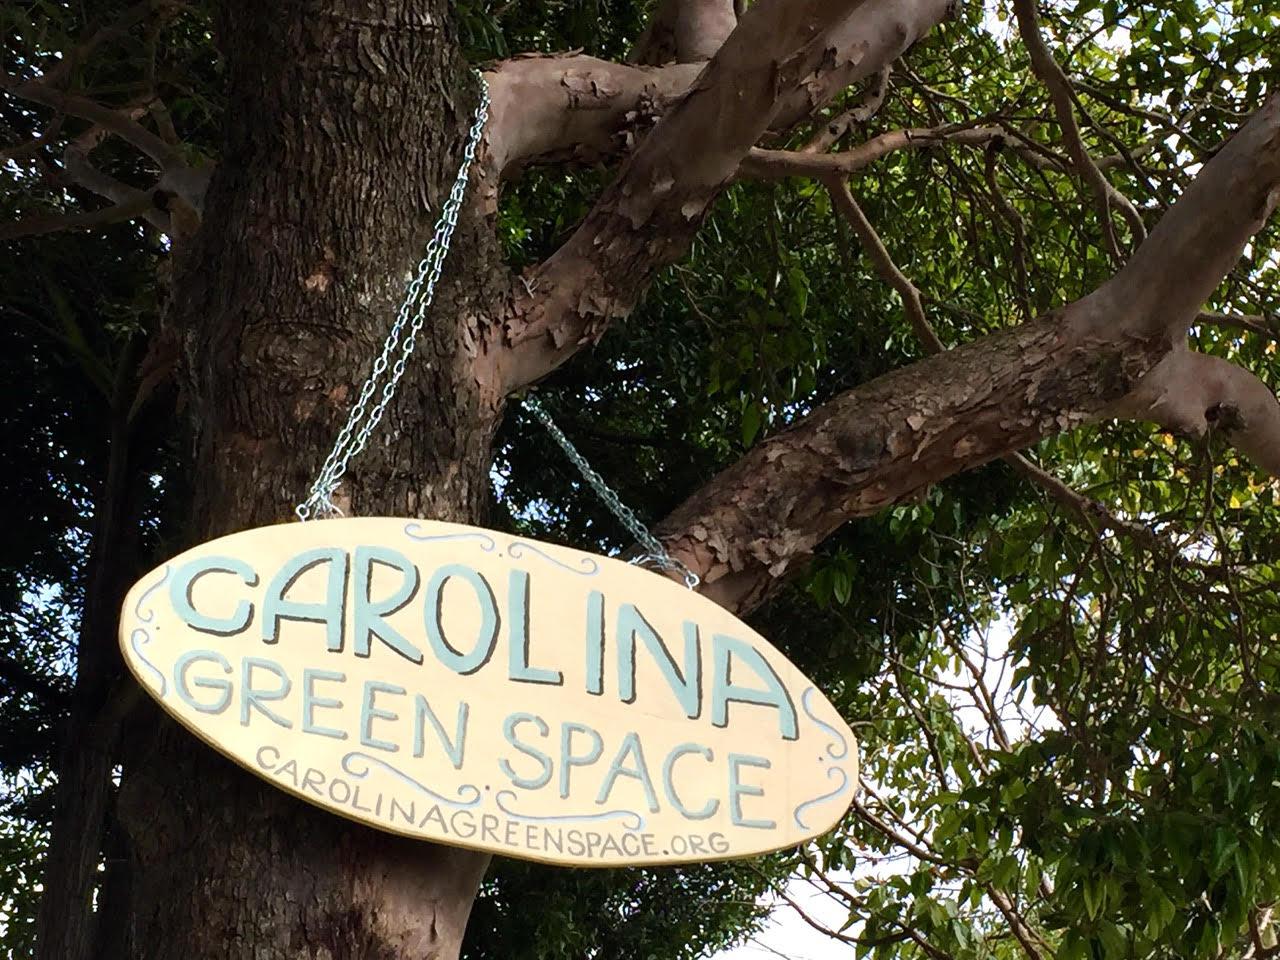 Carolina Green Space